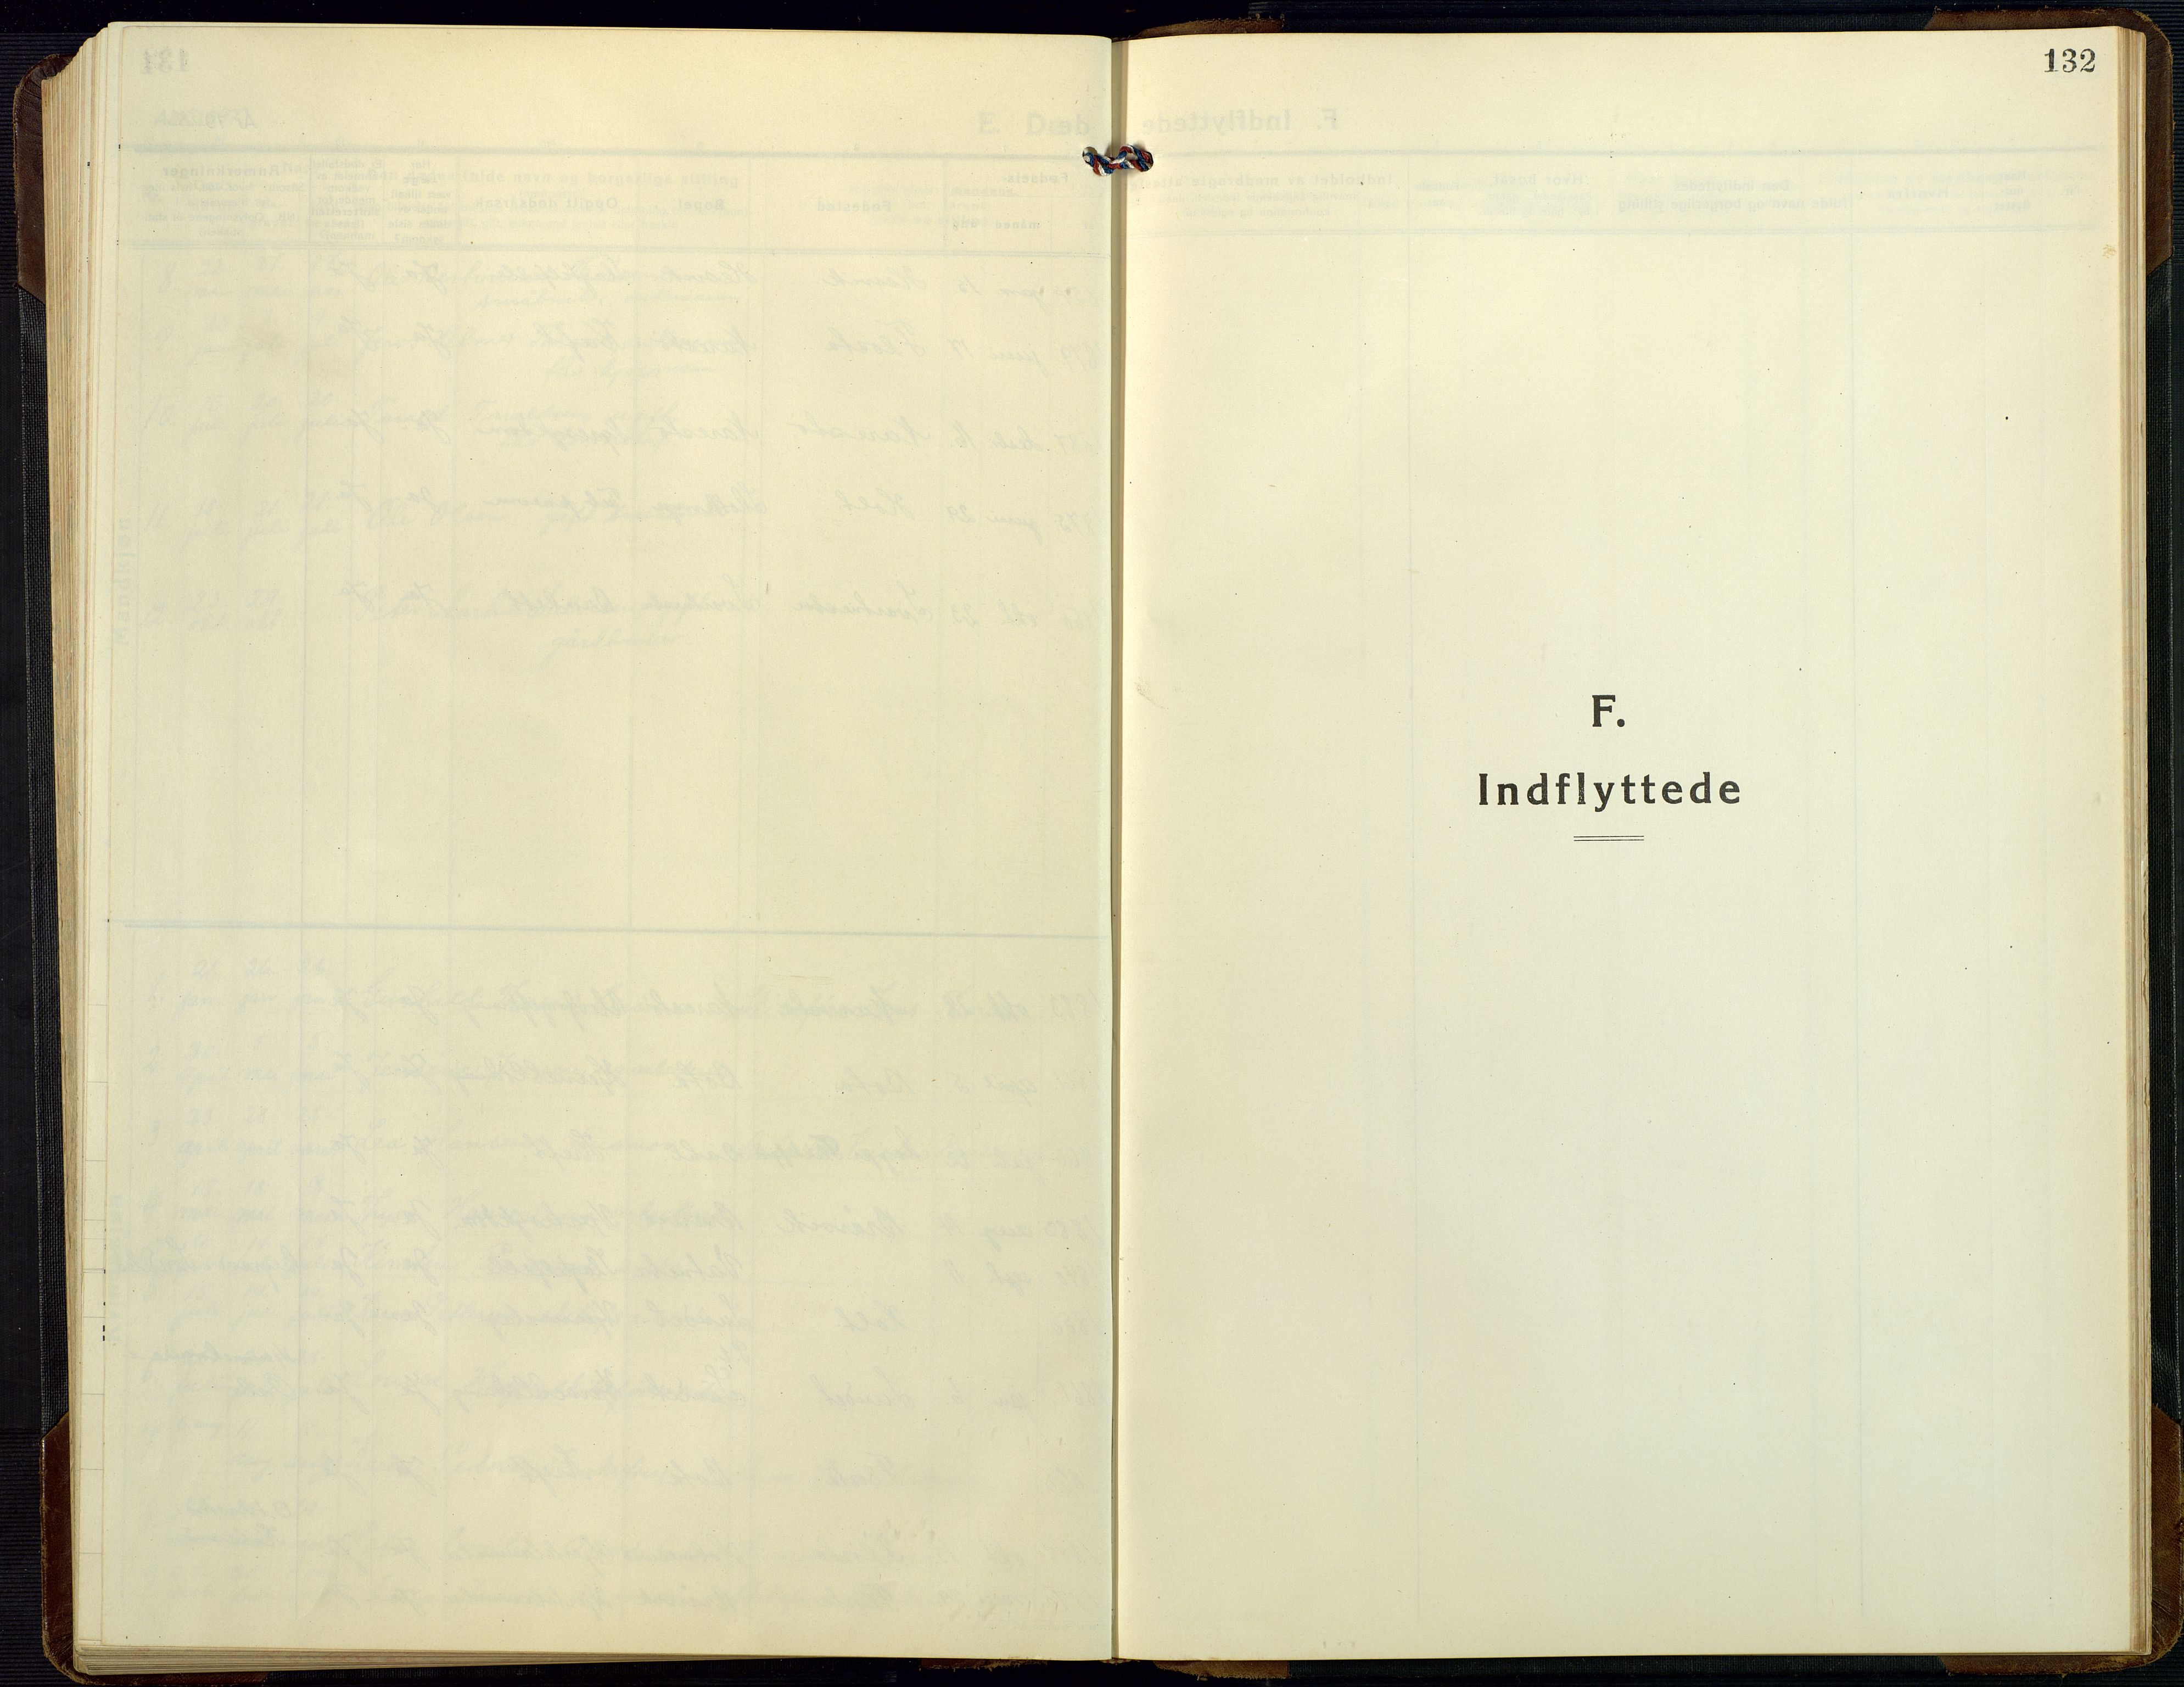 SAK, Dypvåg sokneprestkontor, F/Fb/Fbb/L0006: Klokkerbok nr. B 6, 1925-1954, s. 132